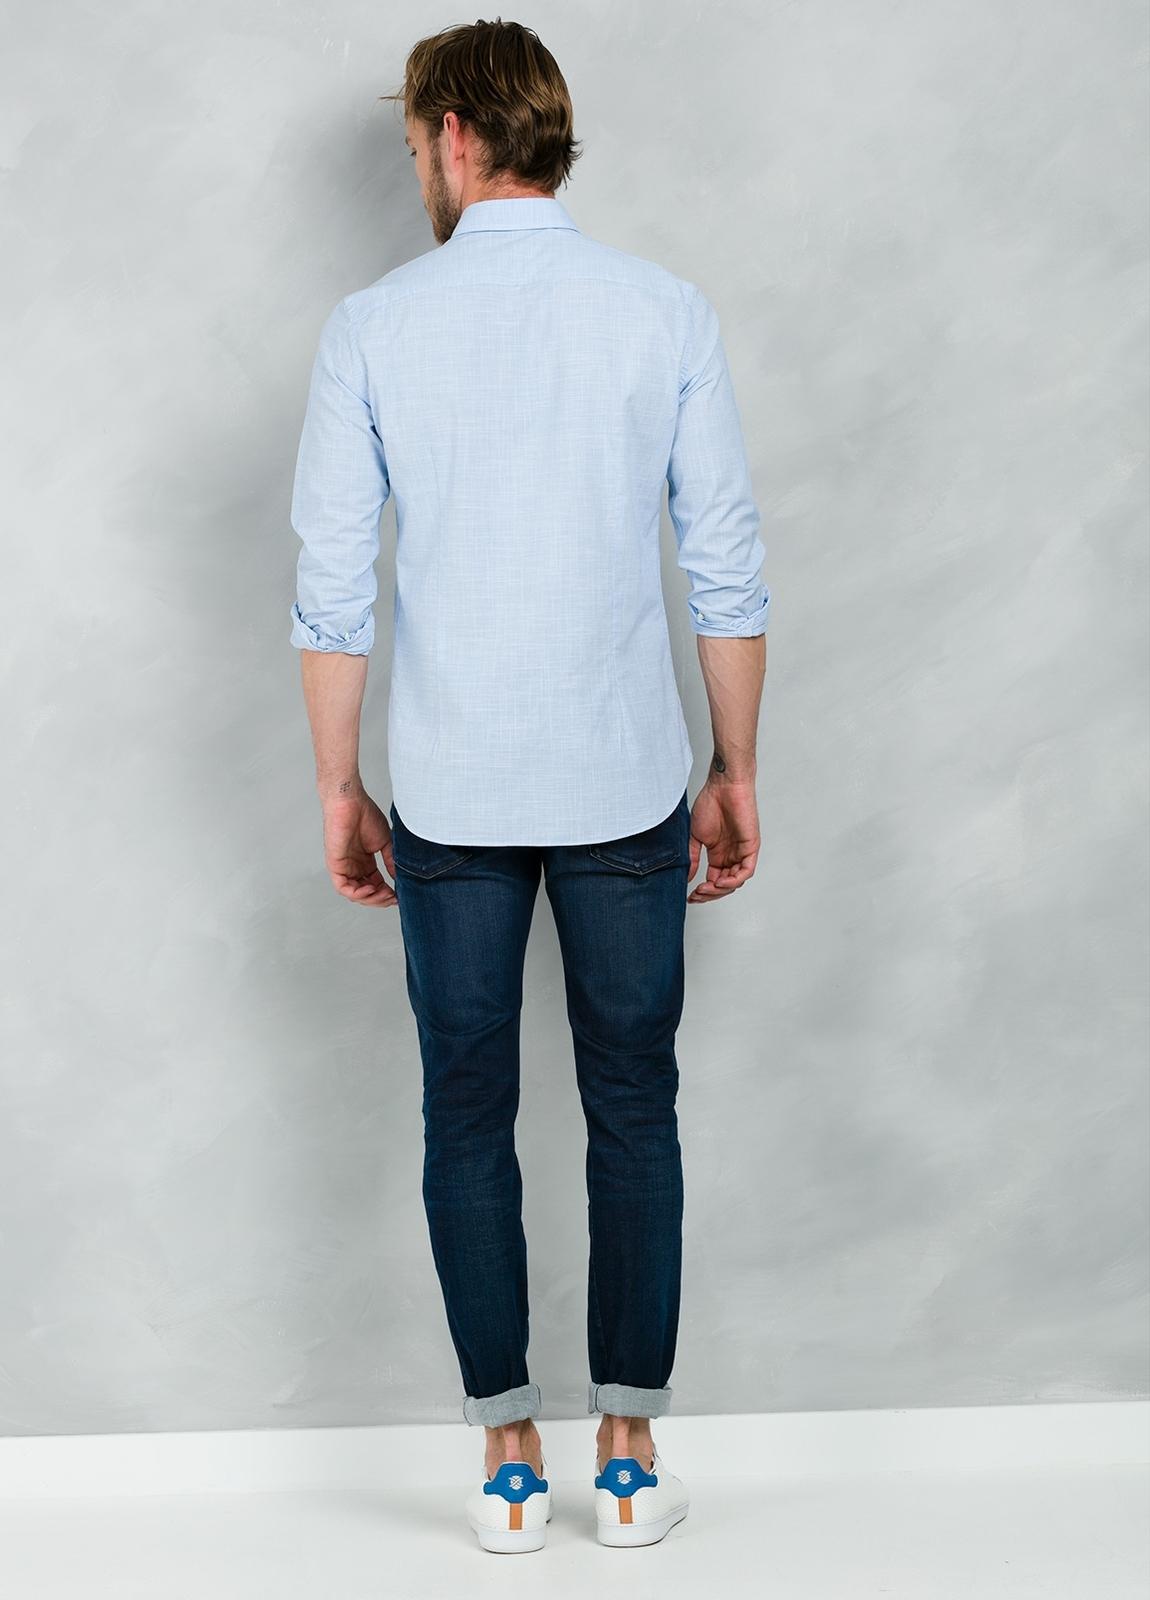 Camisa Casual Wear SLIM FIT Modelo BUTTON DOWN dibujo pata de gallo color celeste, 100% Algodón. - Ítem3